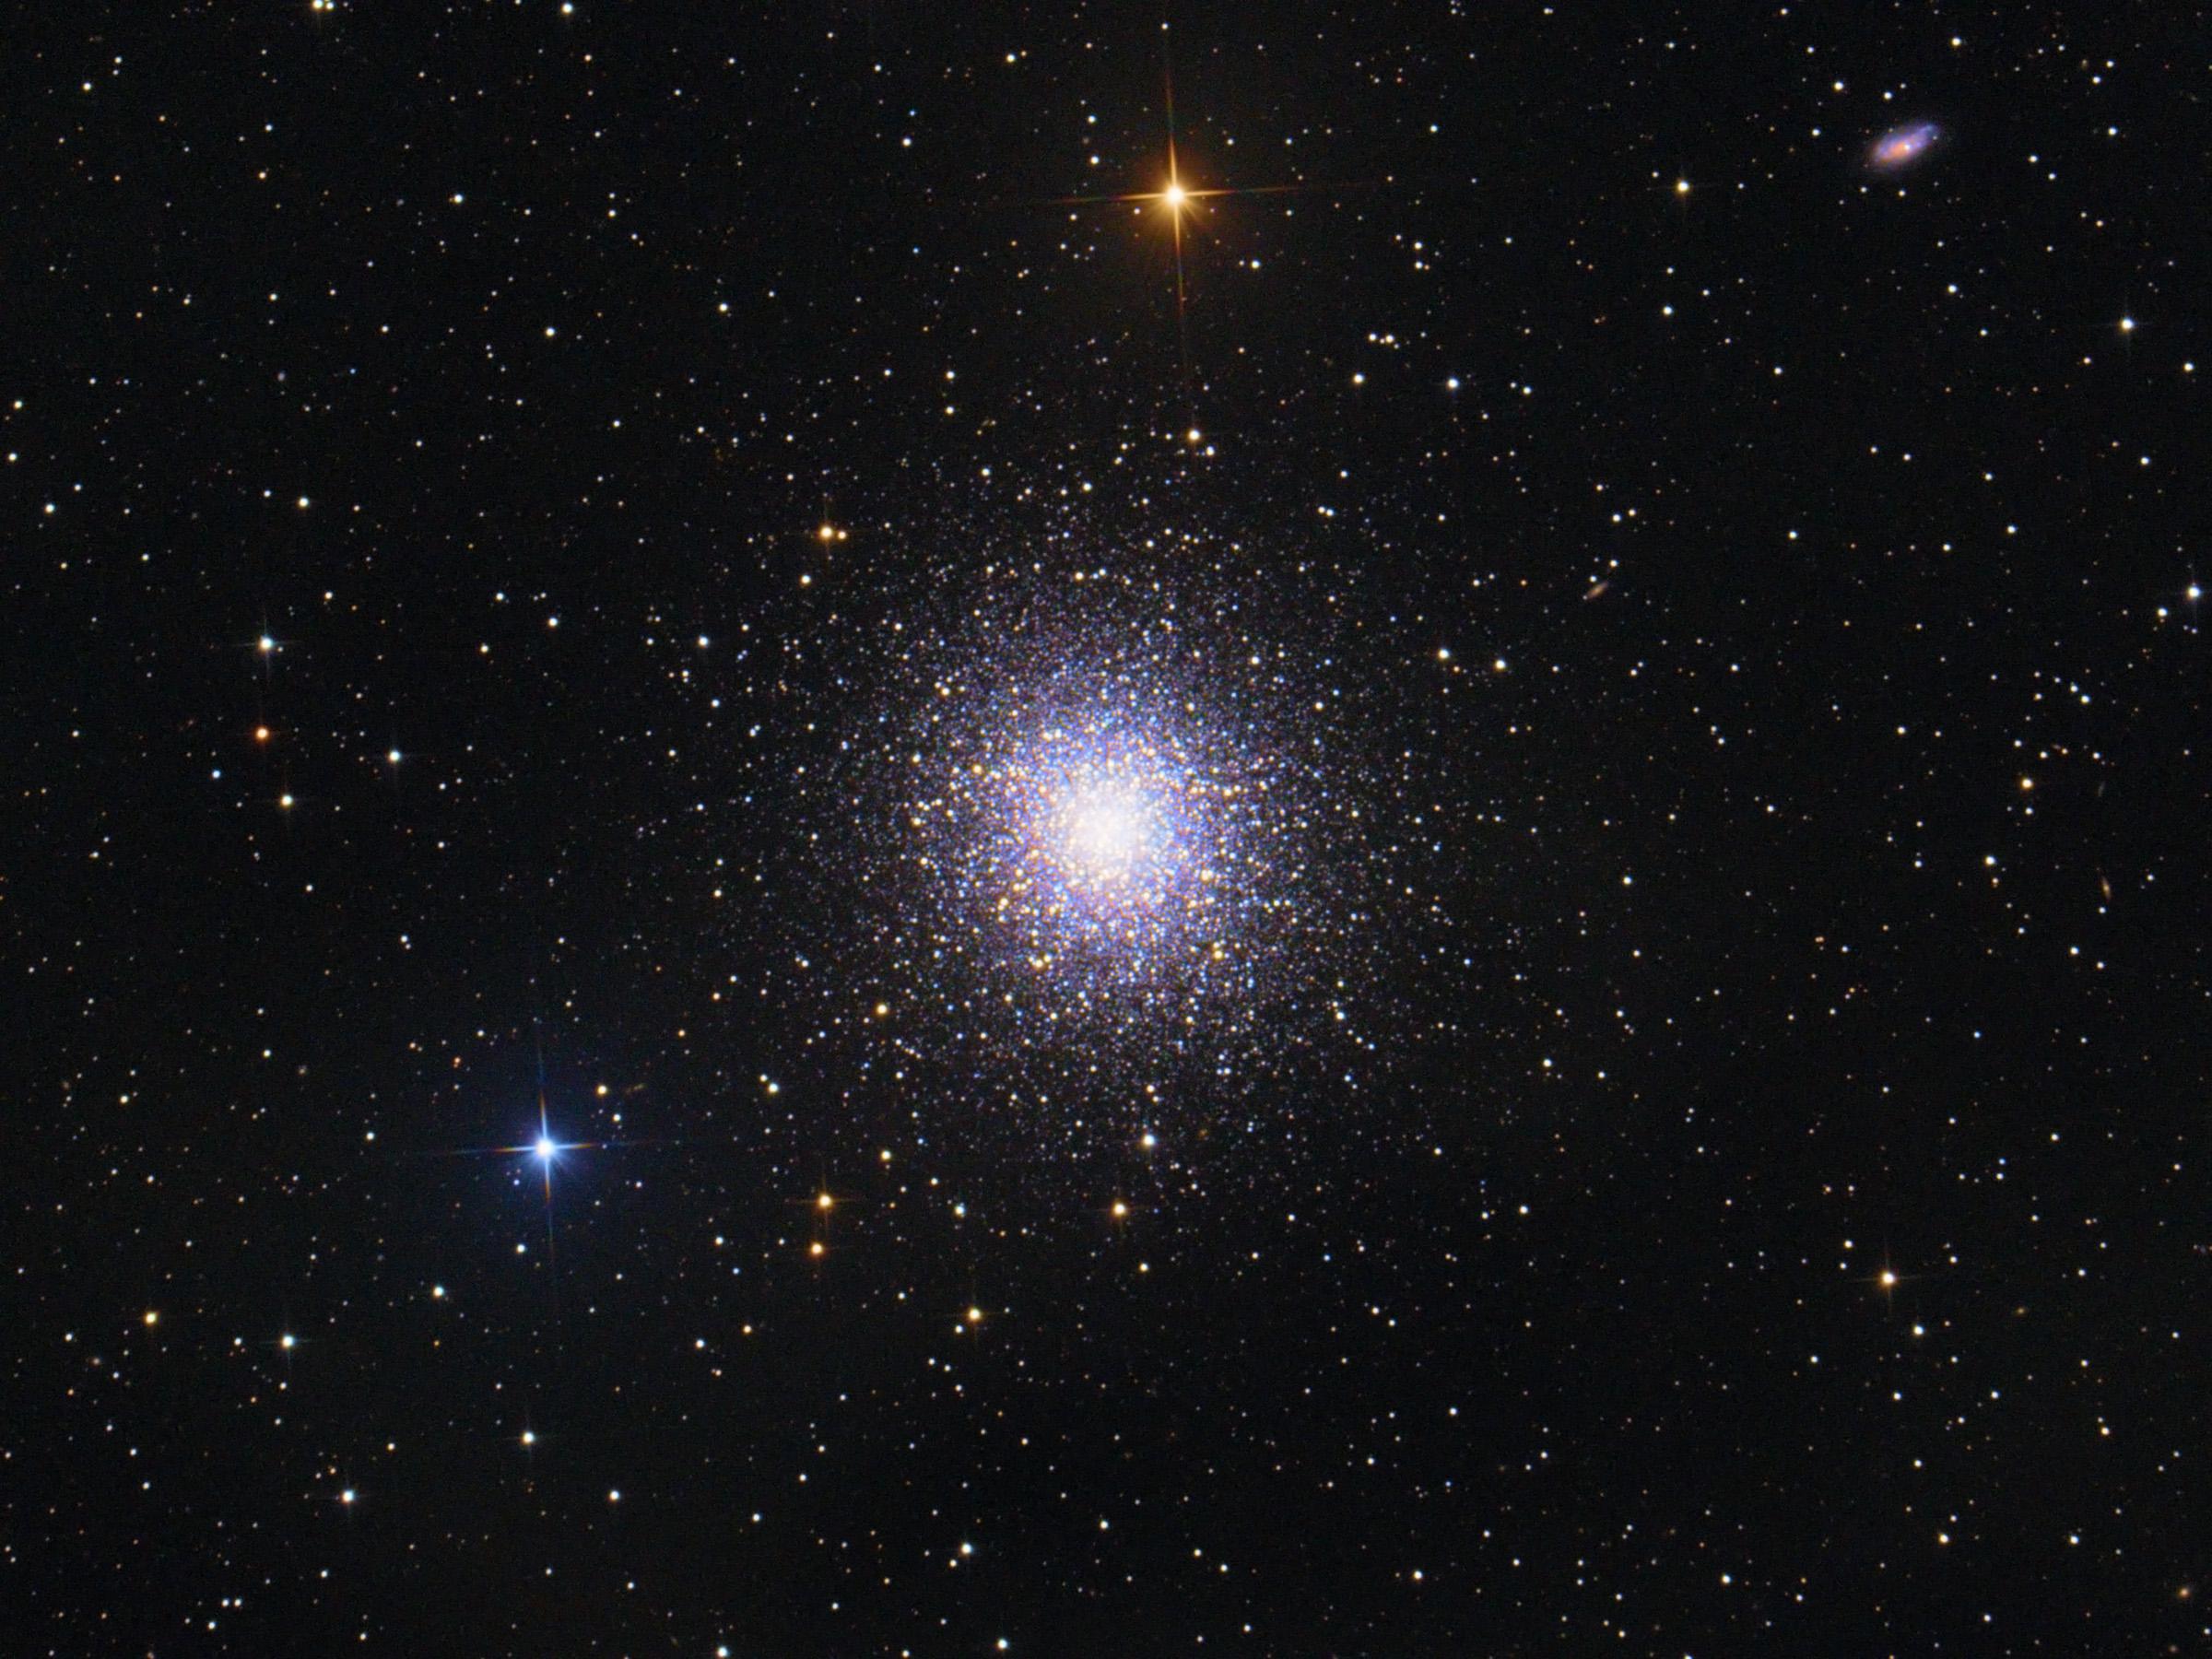 M13 Herkules-gömbhalmaz